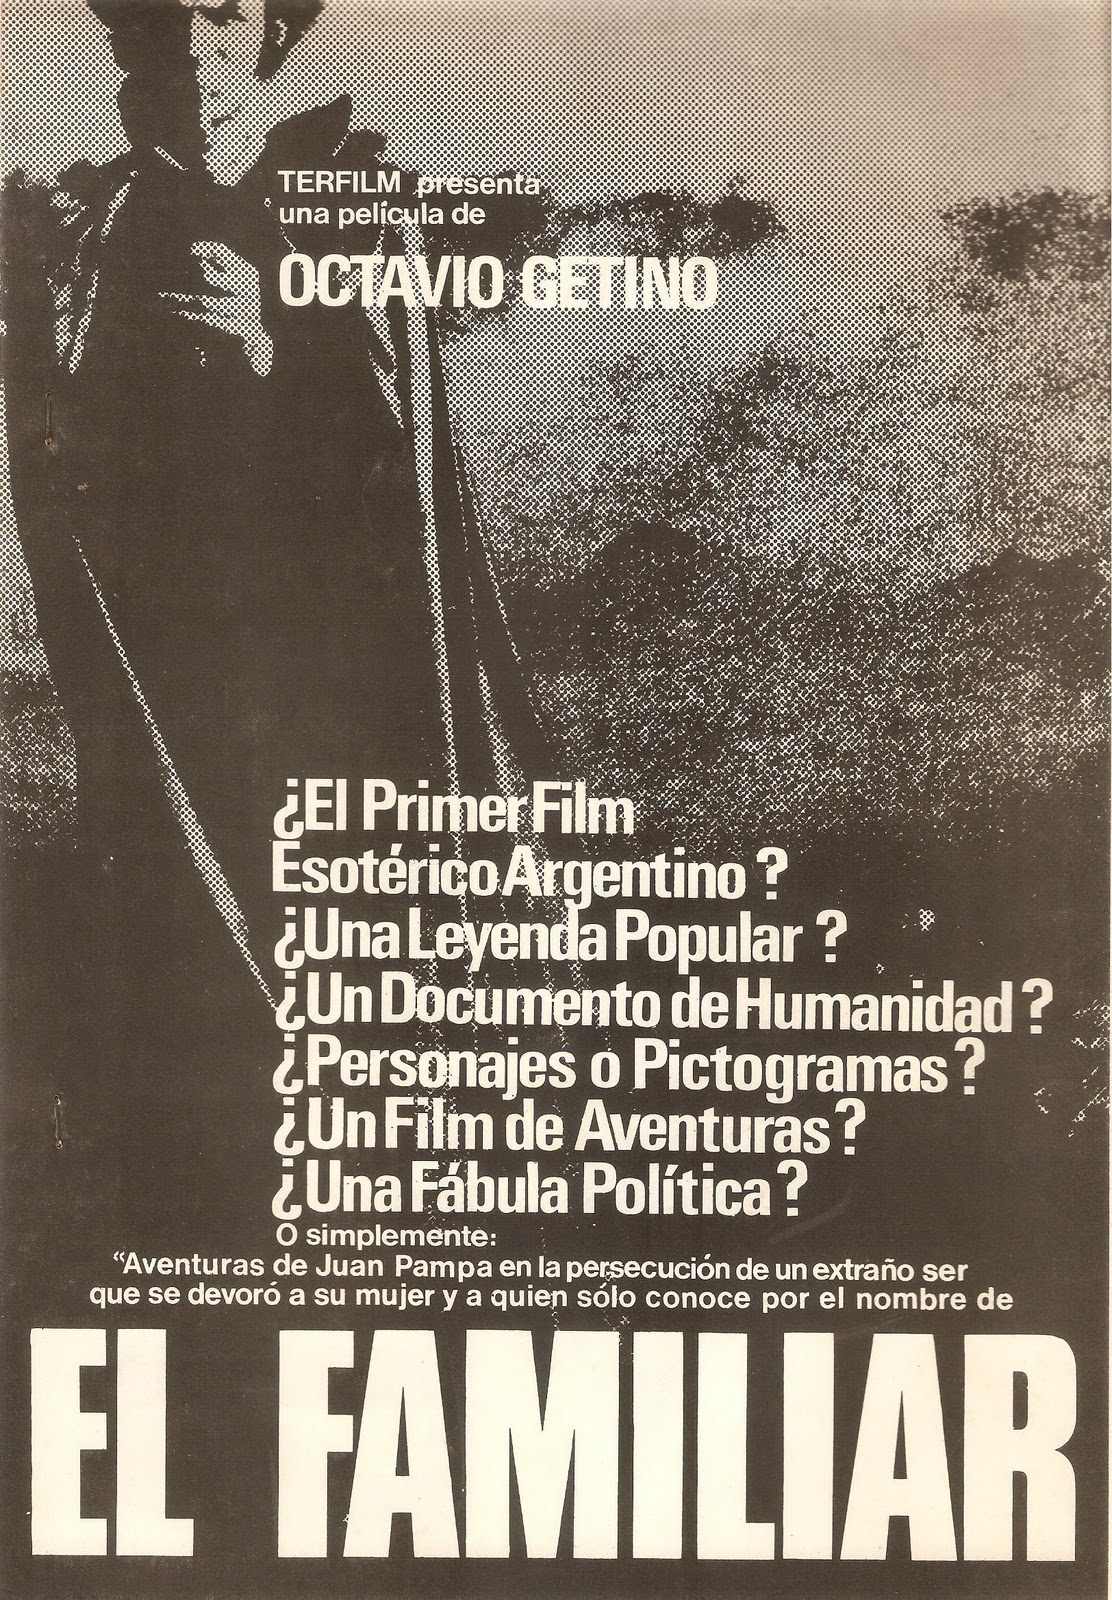 http://1.bp.blogspot.com/_2X_-FVOWUNk/TJ30hWA7hXI/AAAAAAAAAdo/y5KRCYBoj3A/s1600/Preesbock+El+Familiar.1973.jpg